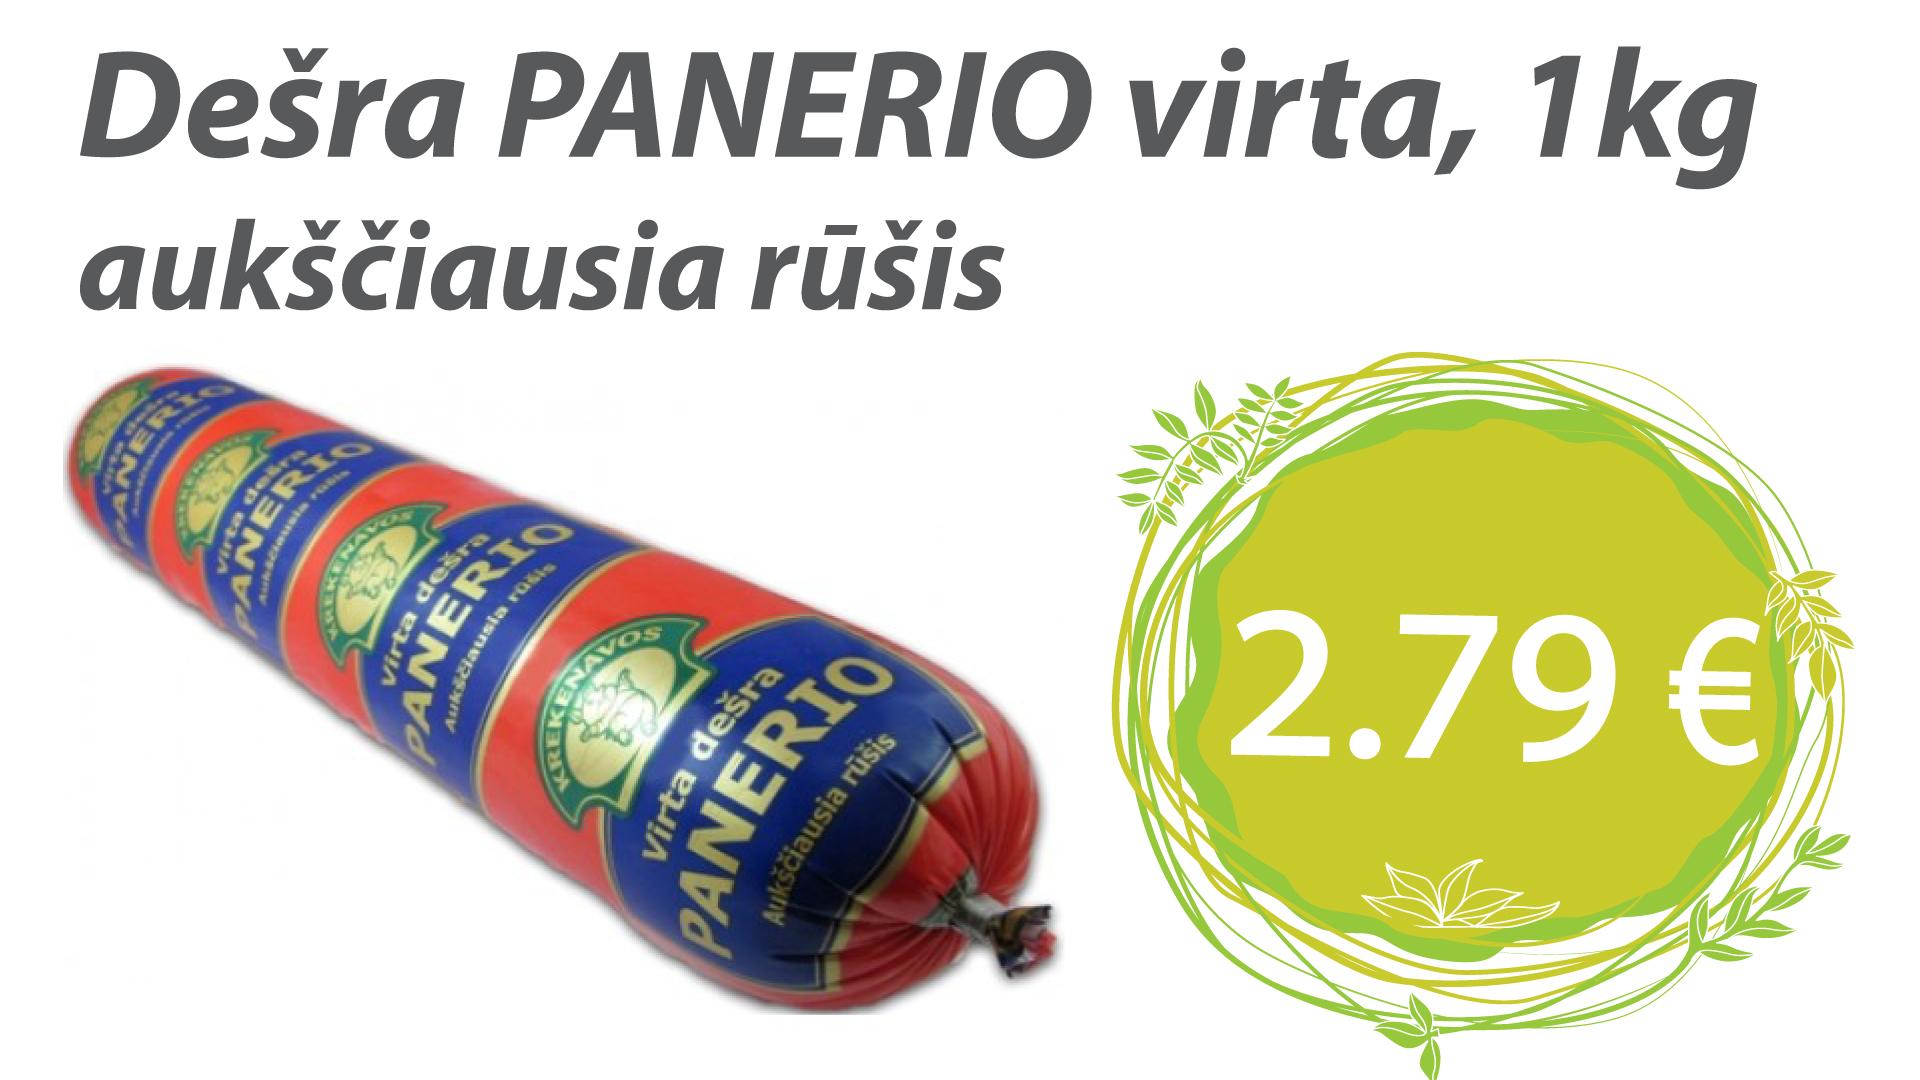 krekenavos-panerio-virta-desra